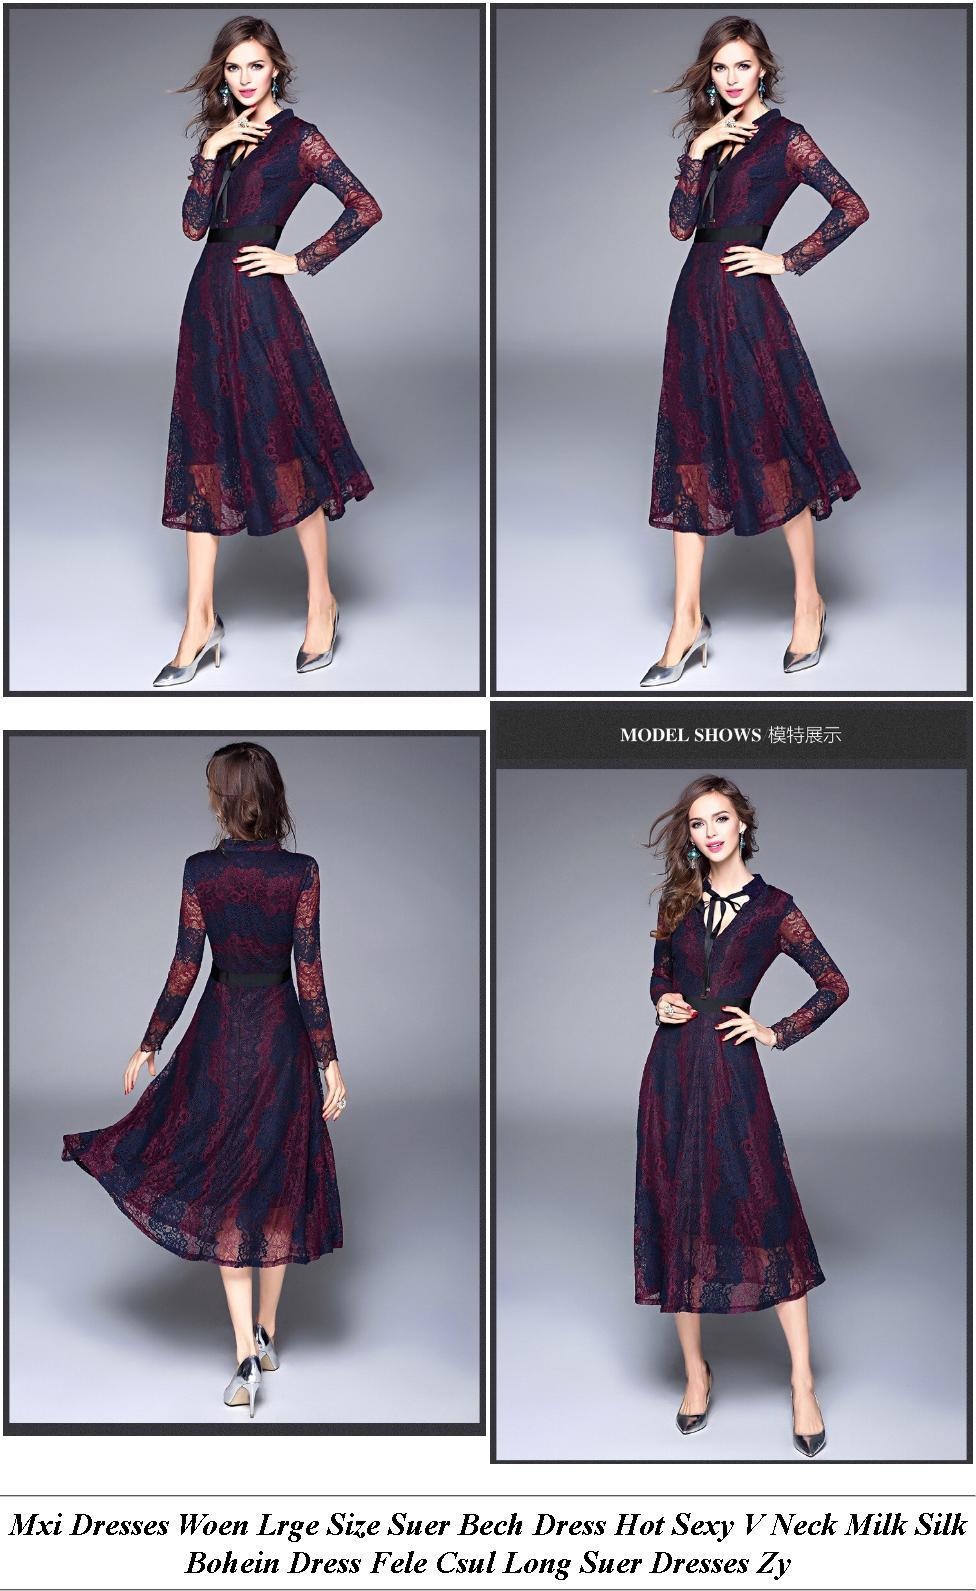 Homecoming Dresses - Dress Sale Uk - Polka Dot Dress - Cheap Clothes Online Shop